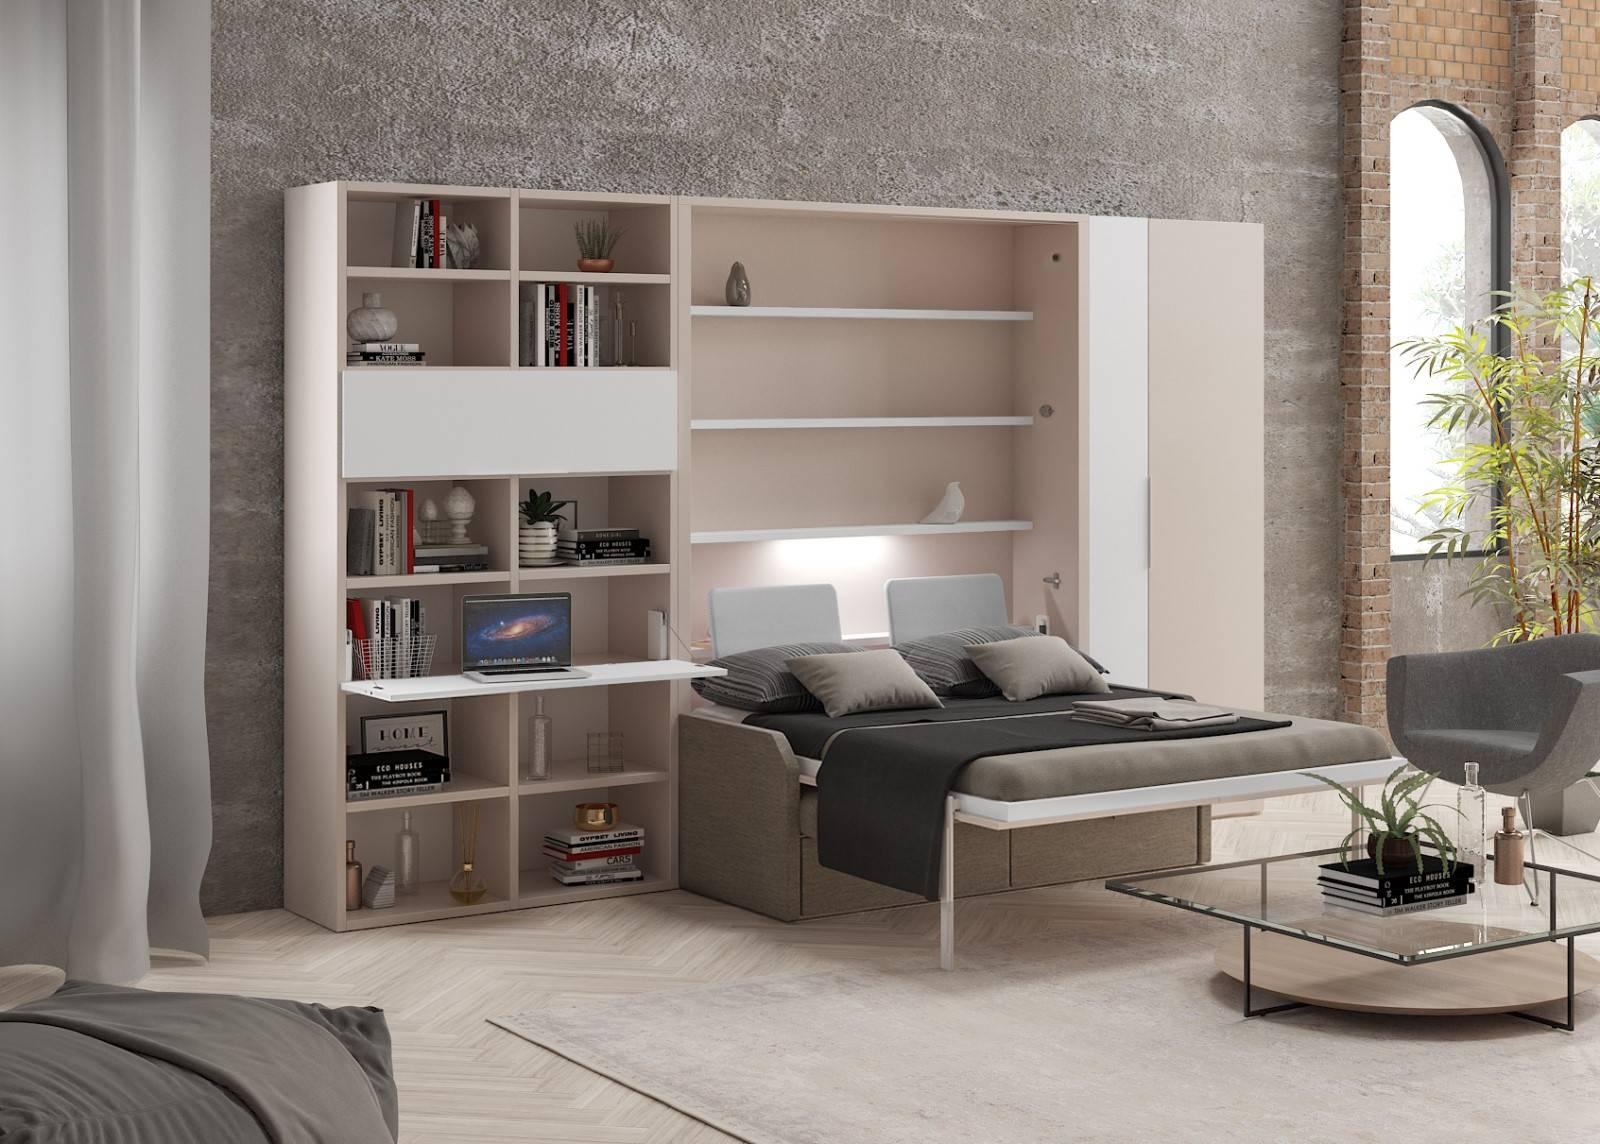 lit escamotable avec canap fr jus compact vertical auto. Black Bedroom Furniture Sets. Home Design Ideas